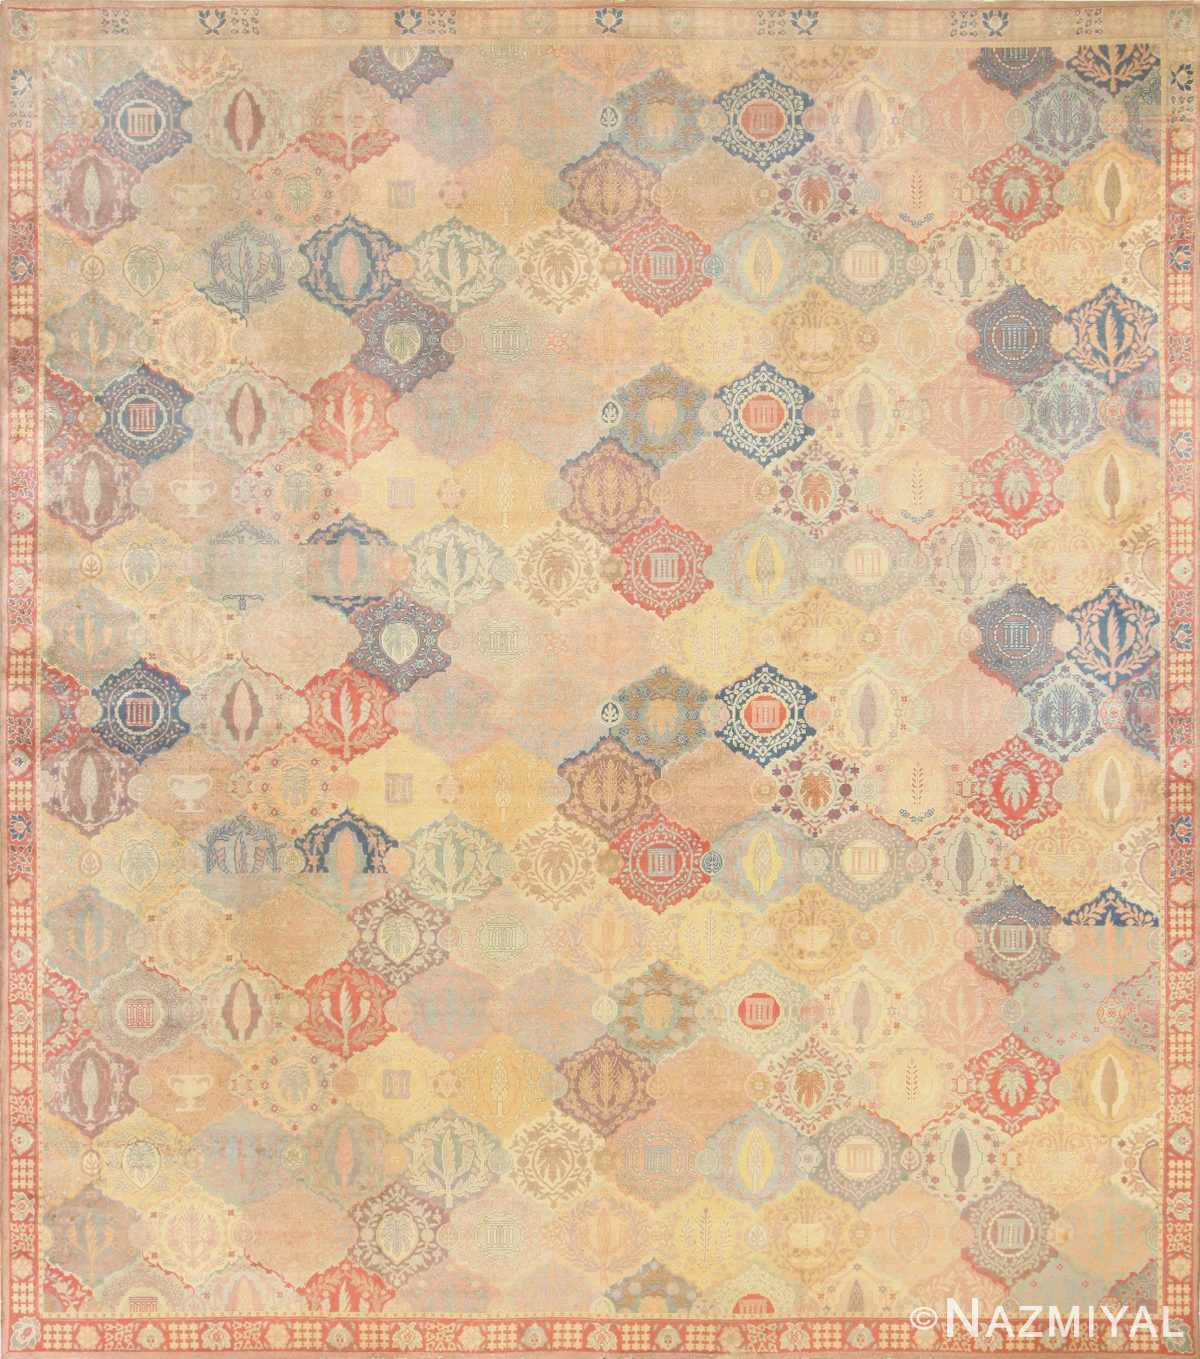 Antique Oversized Israeli Bezalel Carpet 48245 Detail/Large View